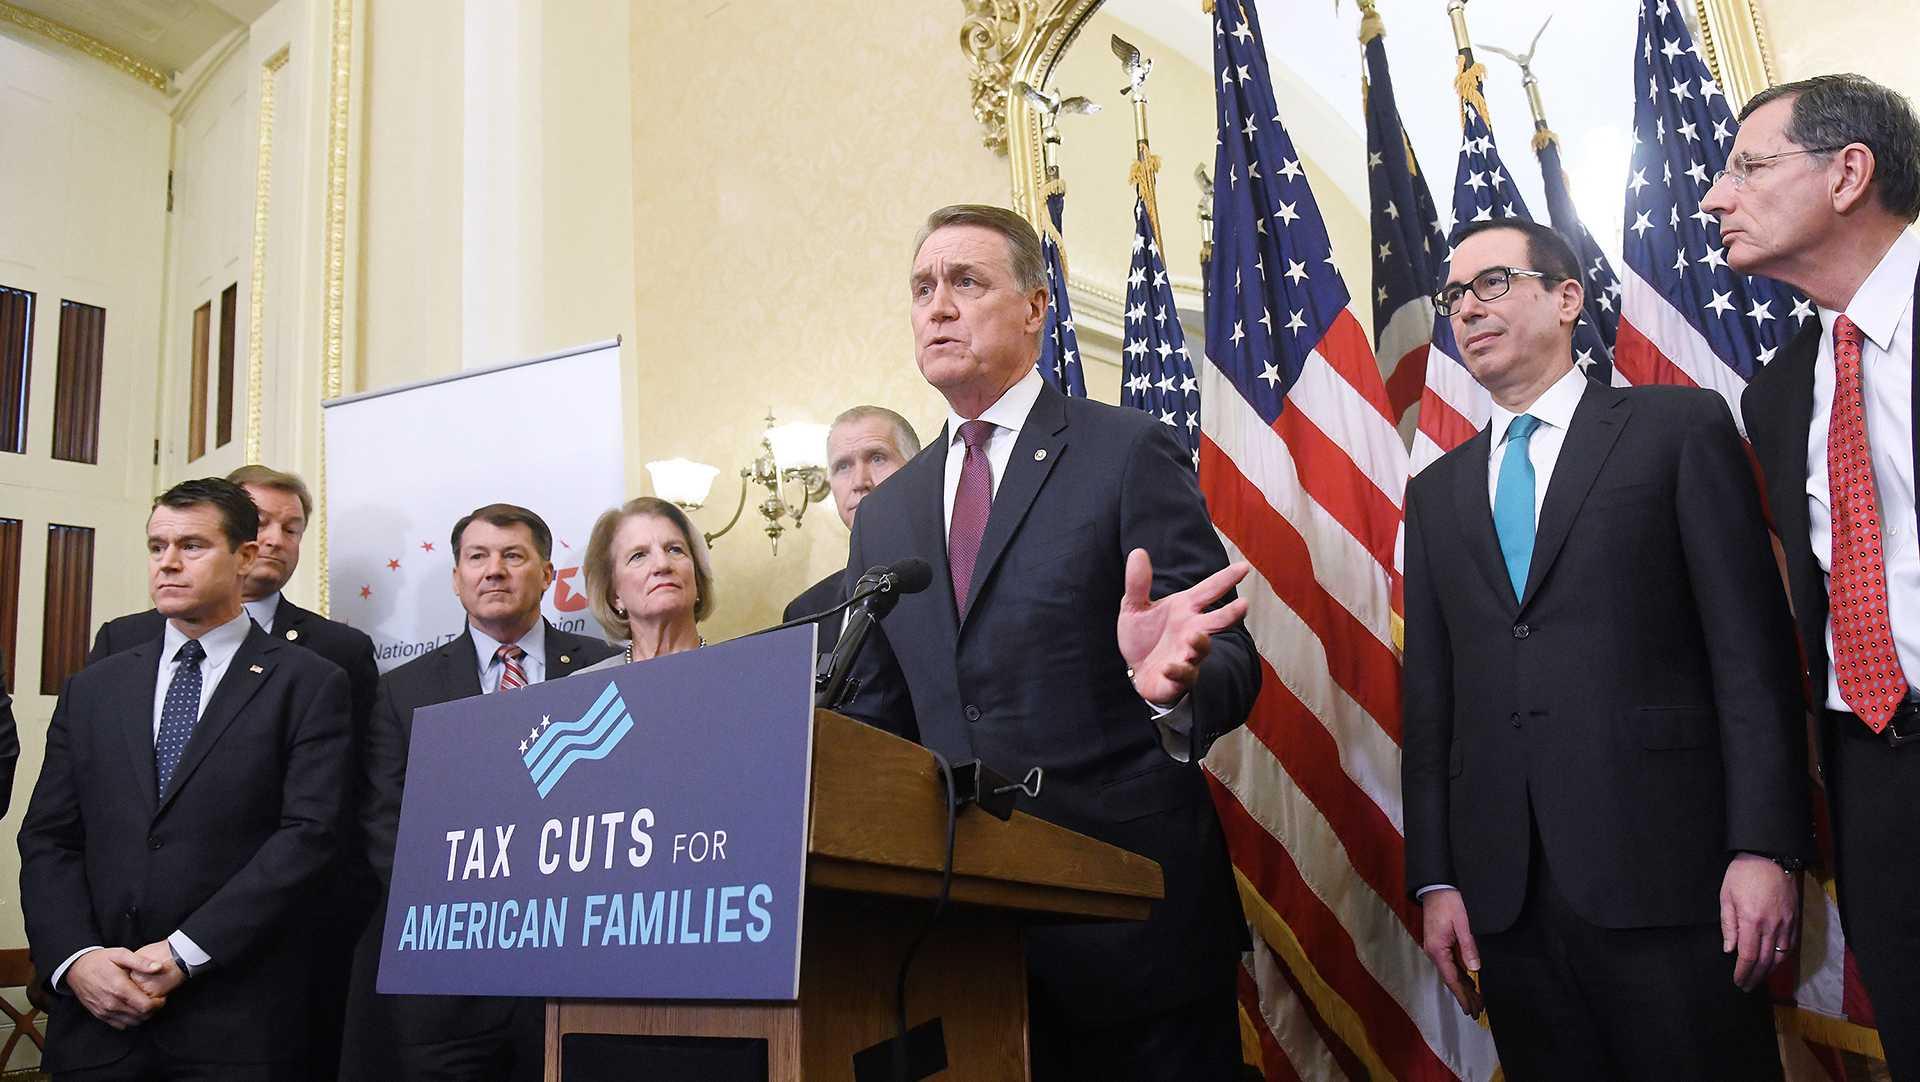 Guest opinion: GOP tax plan disadvantages graduate students